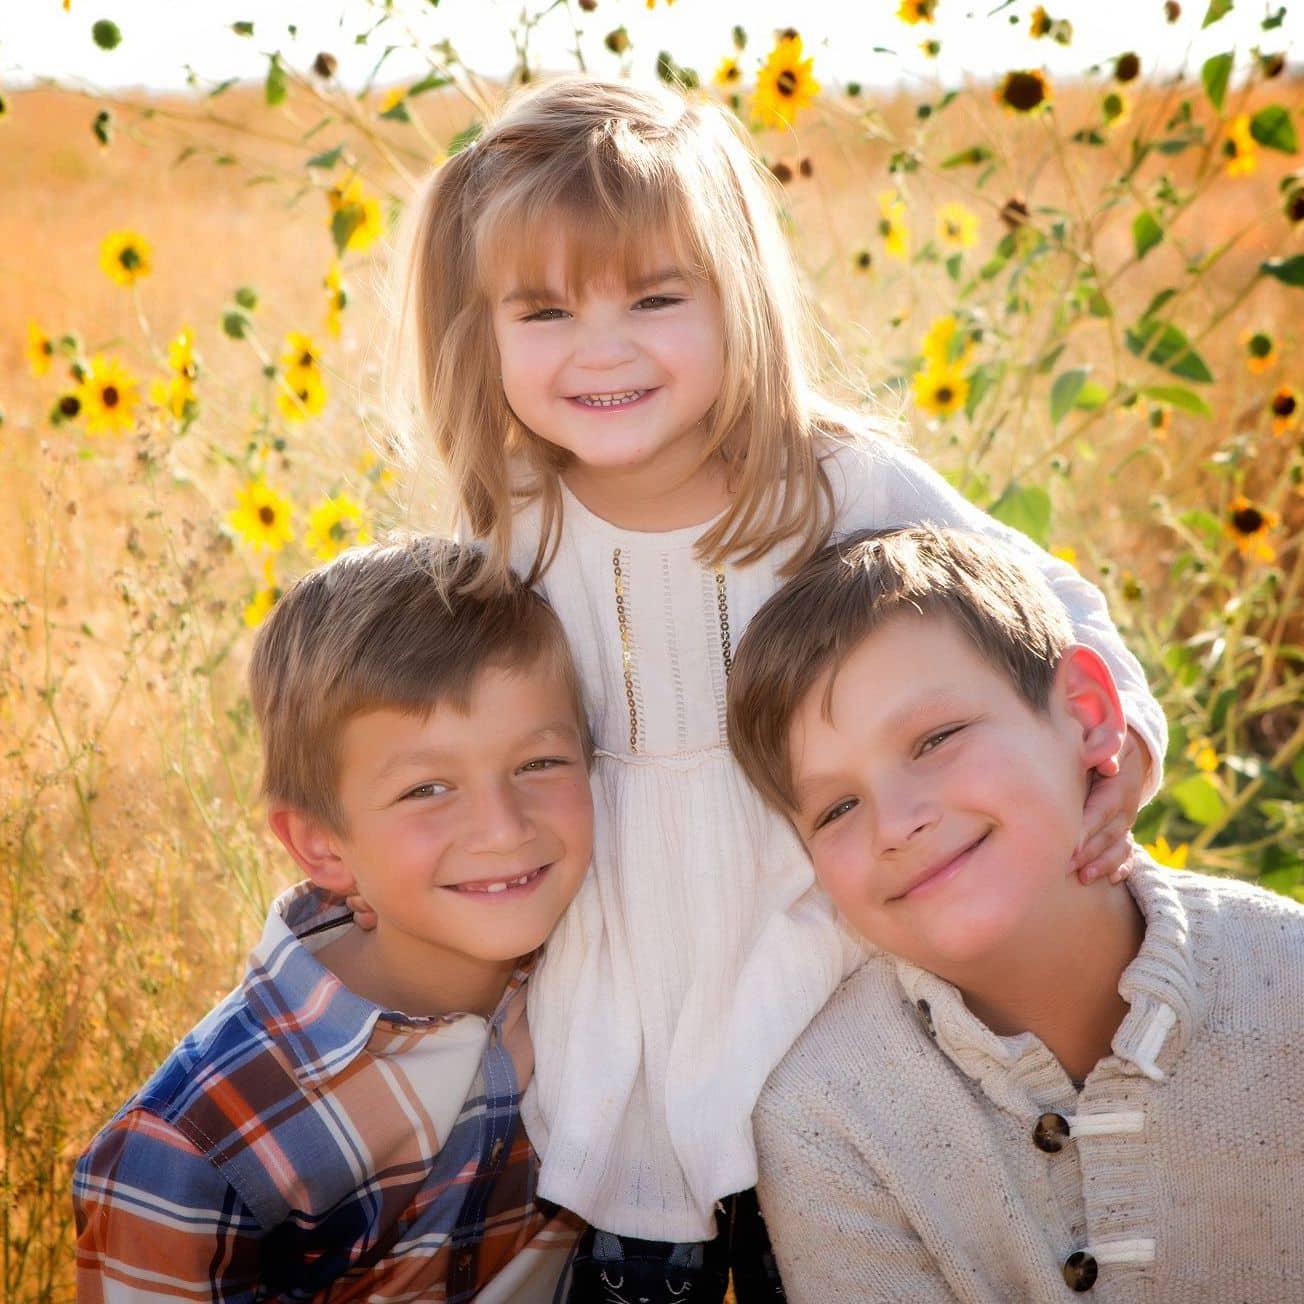 Kids in Sunflowers.